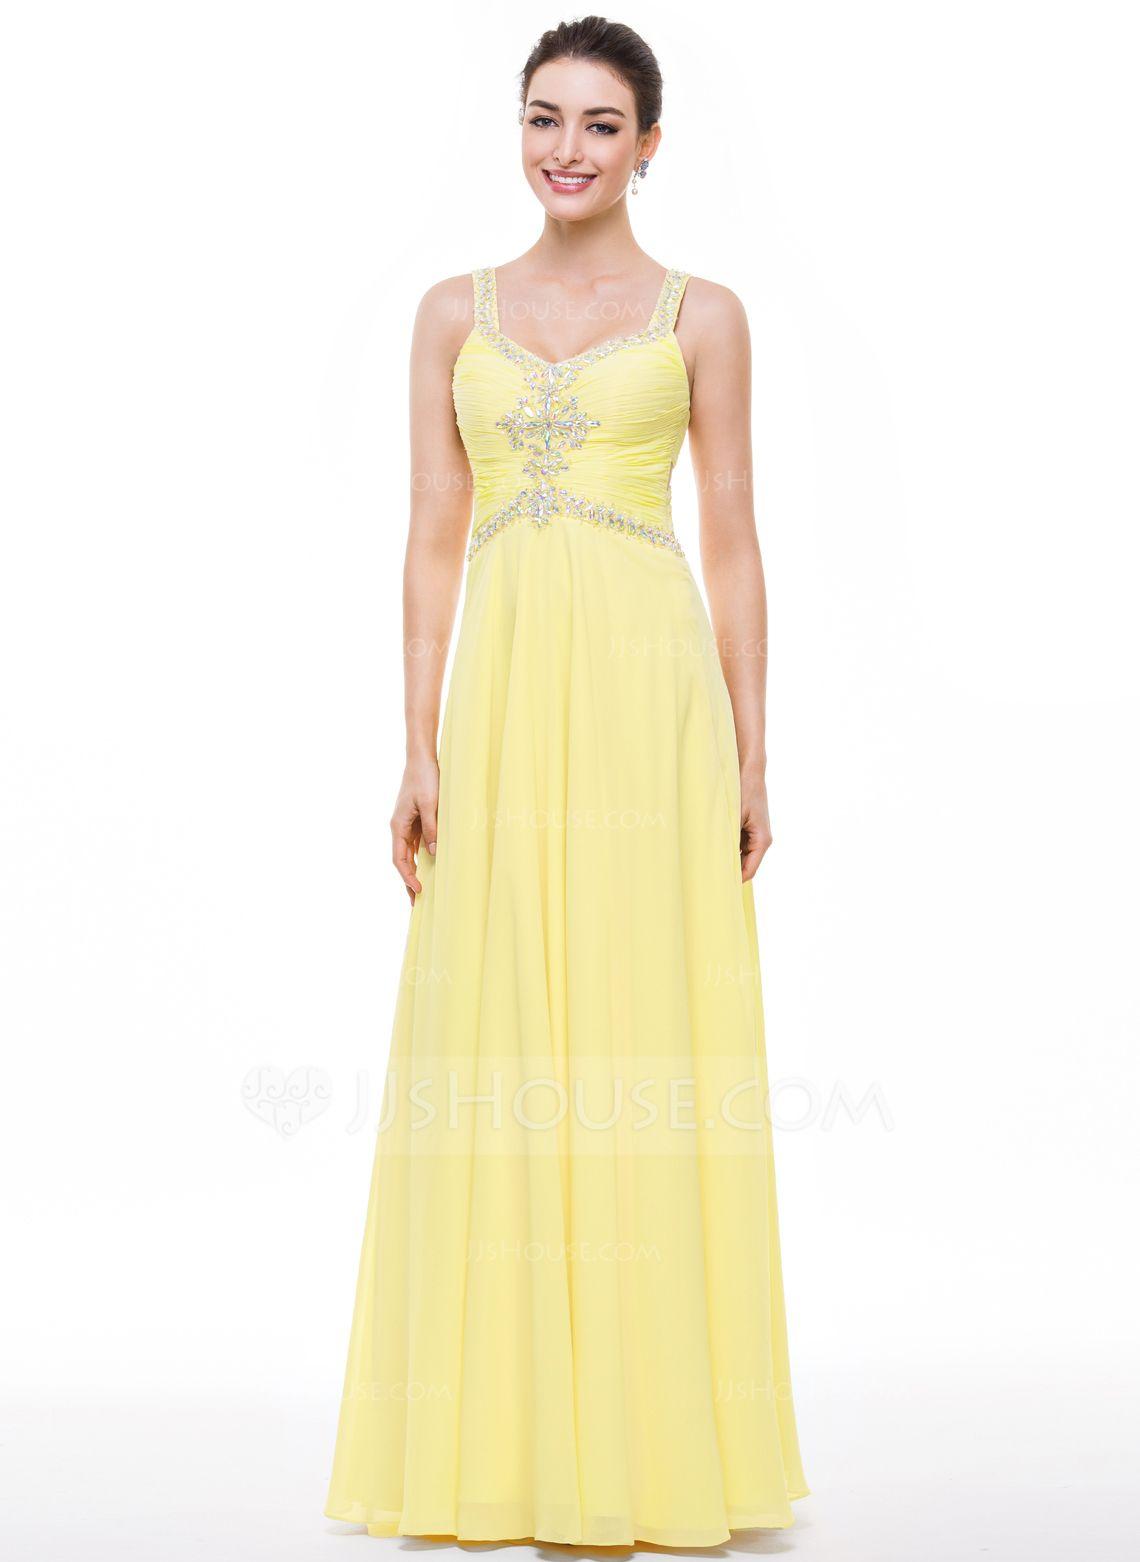 Alineprincess vneck floorlength chiffon prom dress with ruffle